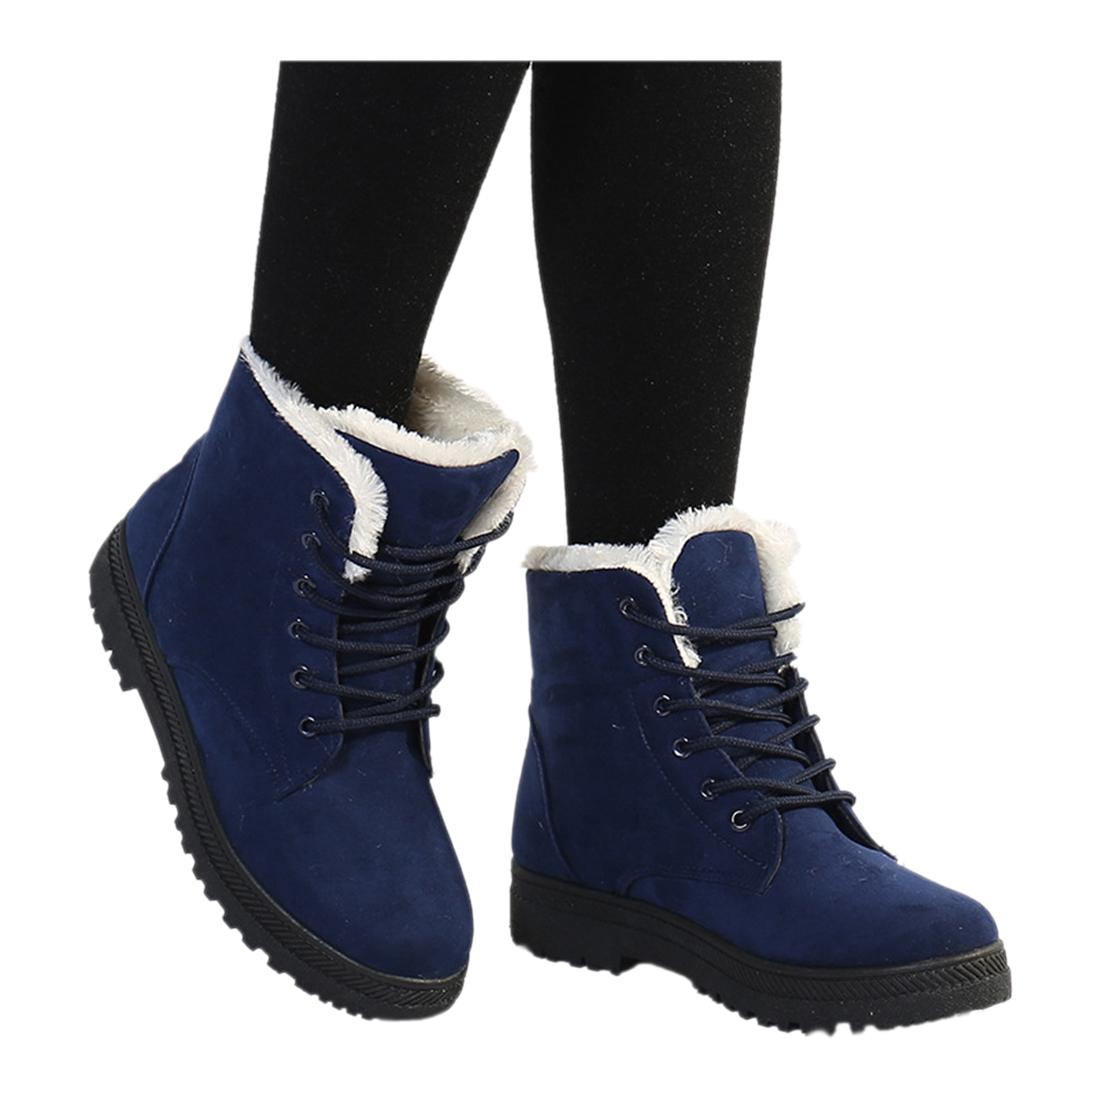 ebay australia womens snow boots david simchi levi